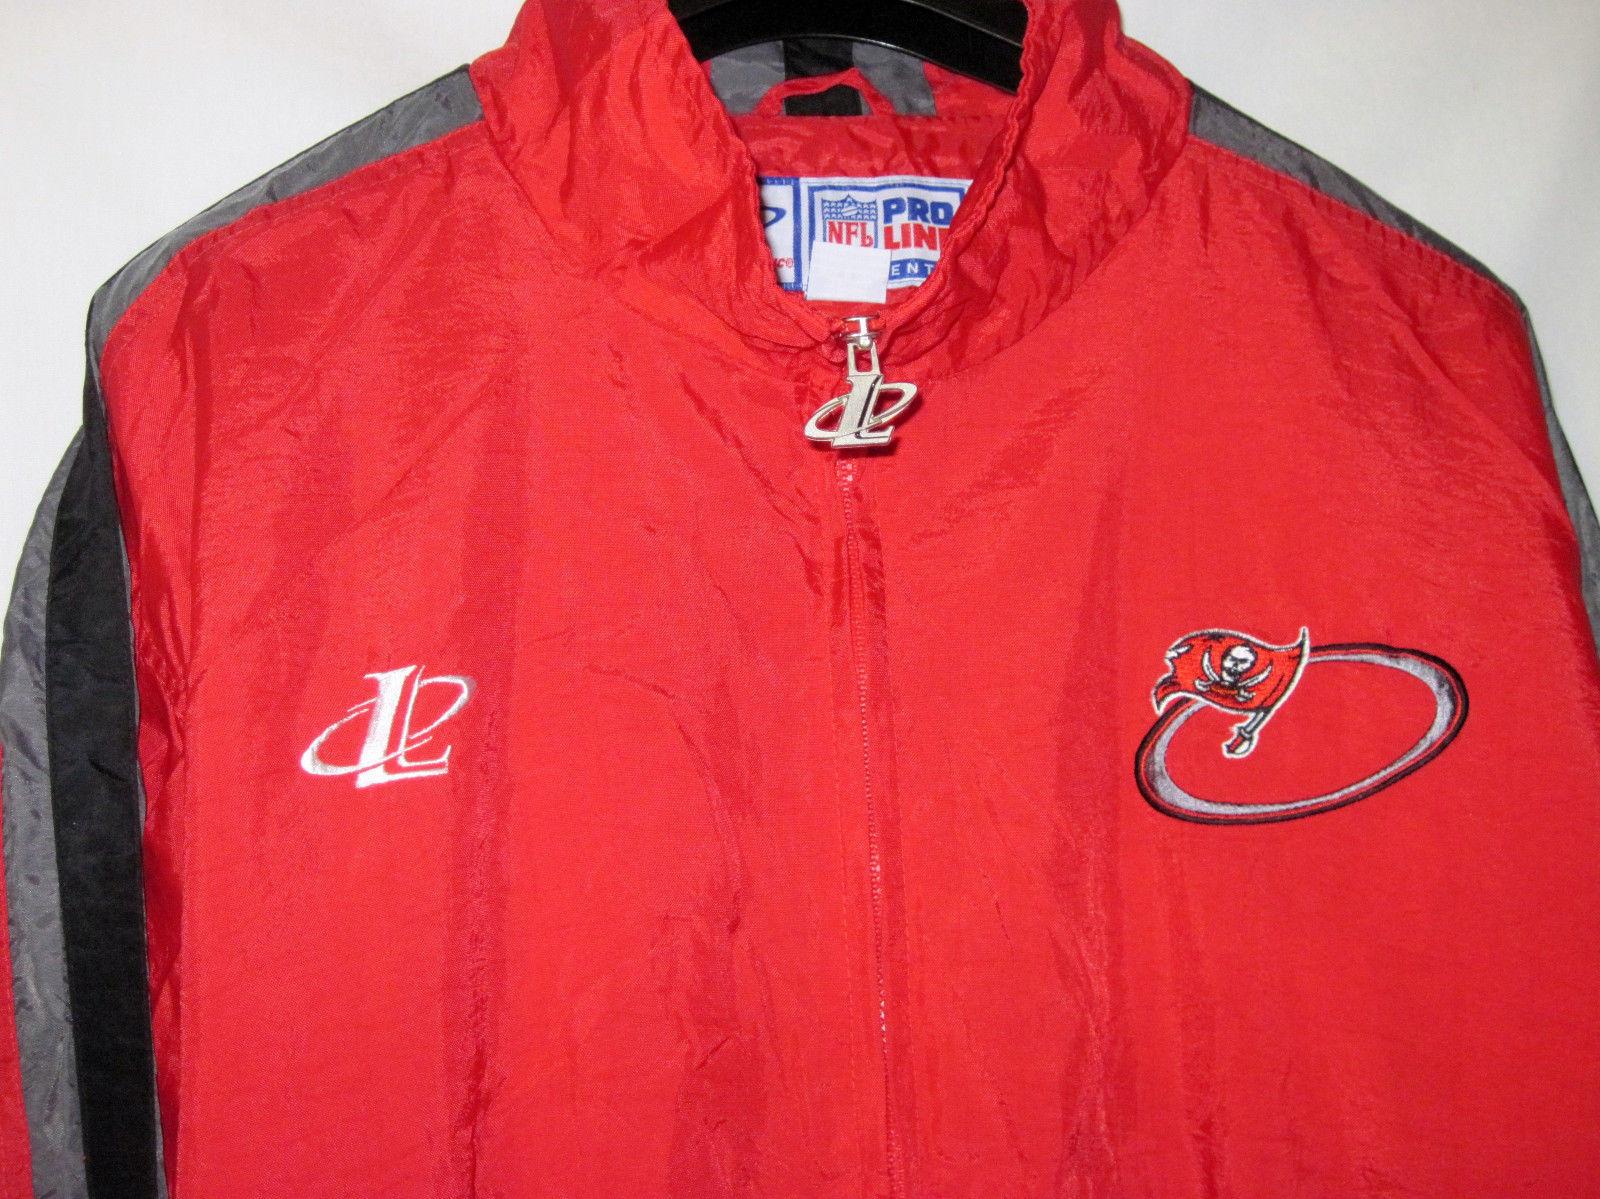 NFL Pro Line Authentic Logo AthleticTampa Bay Buccaneers nylon jacket Zip Up L image 2